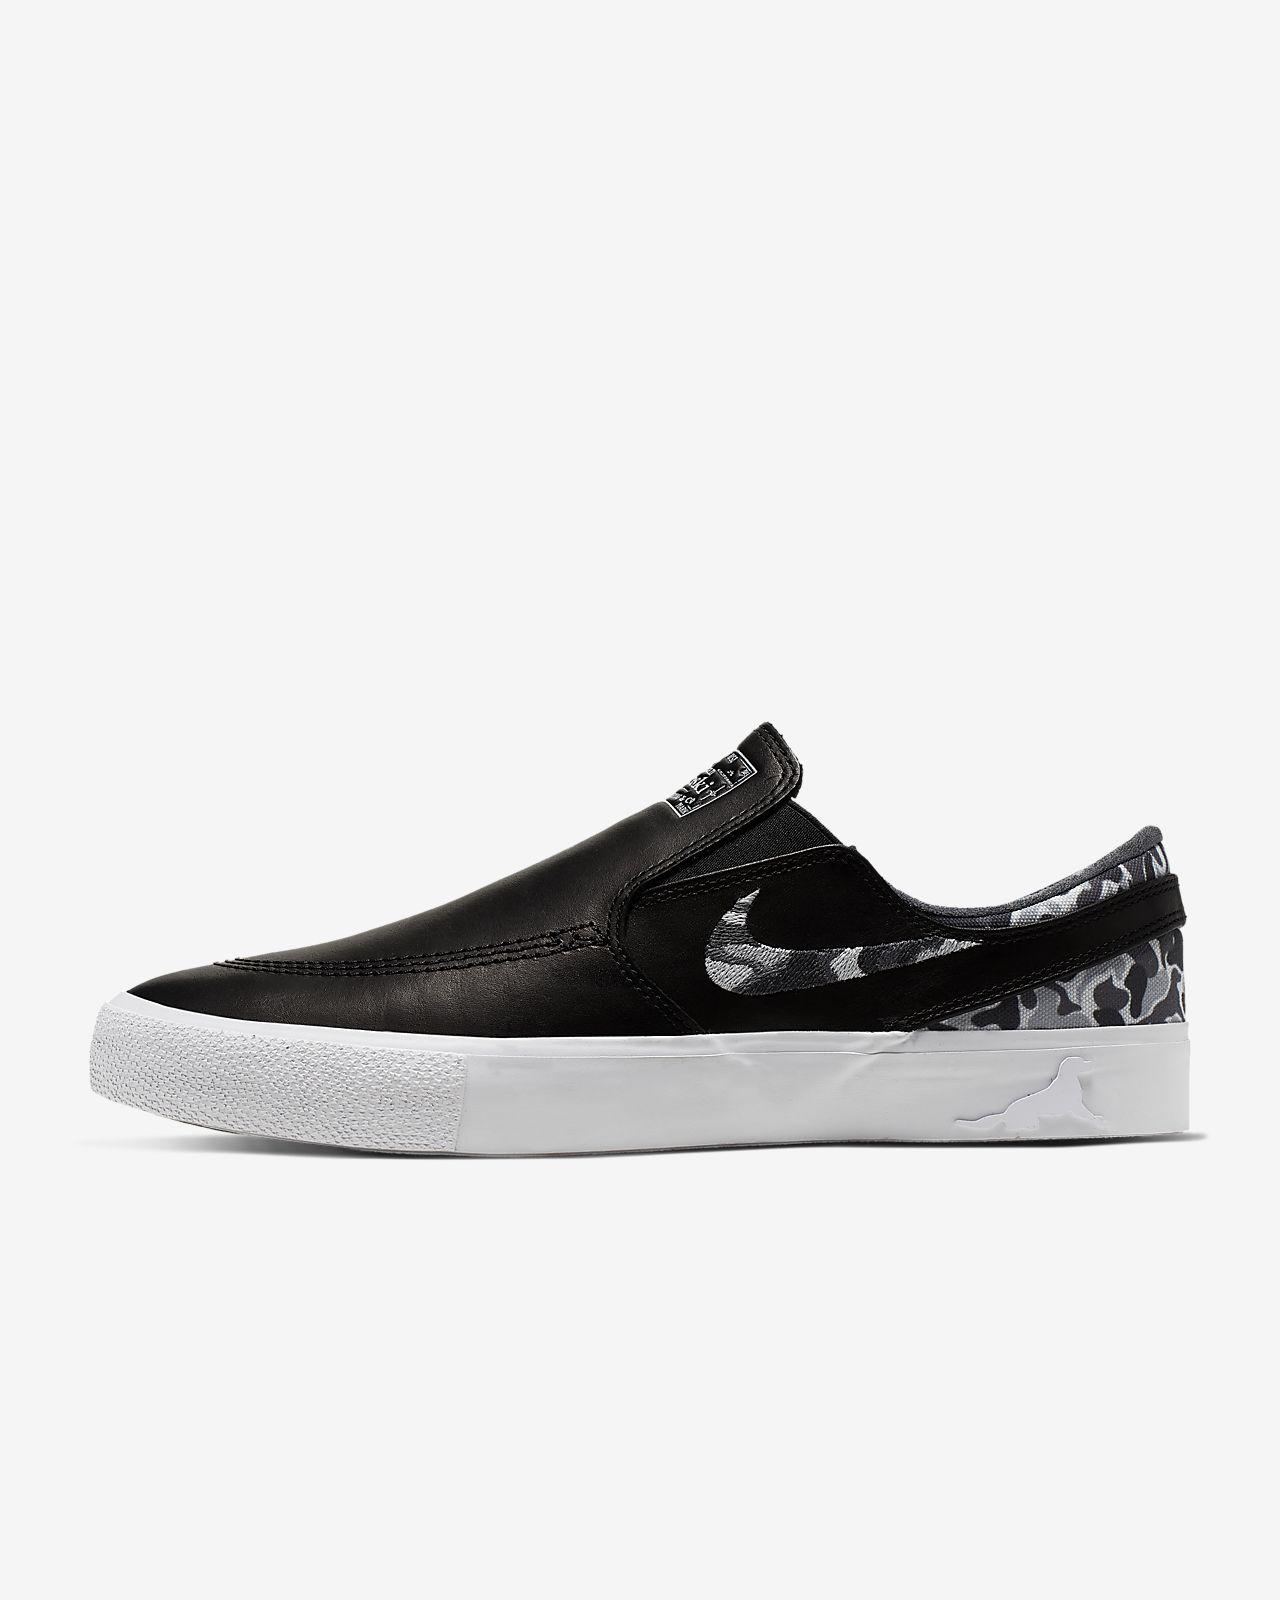 0bfc9a3a94 Nike SB Zoom Stefan Janoski Slip RM Skate Shoe